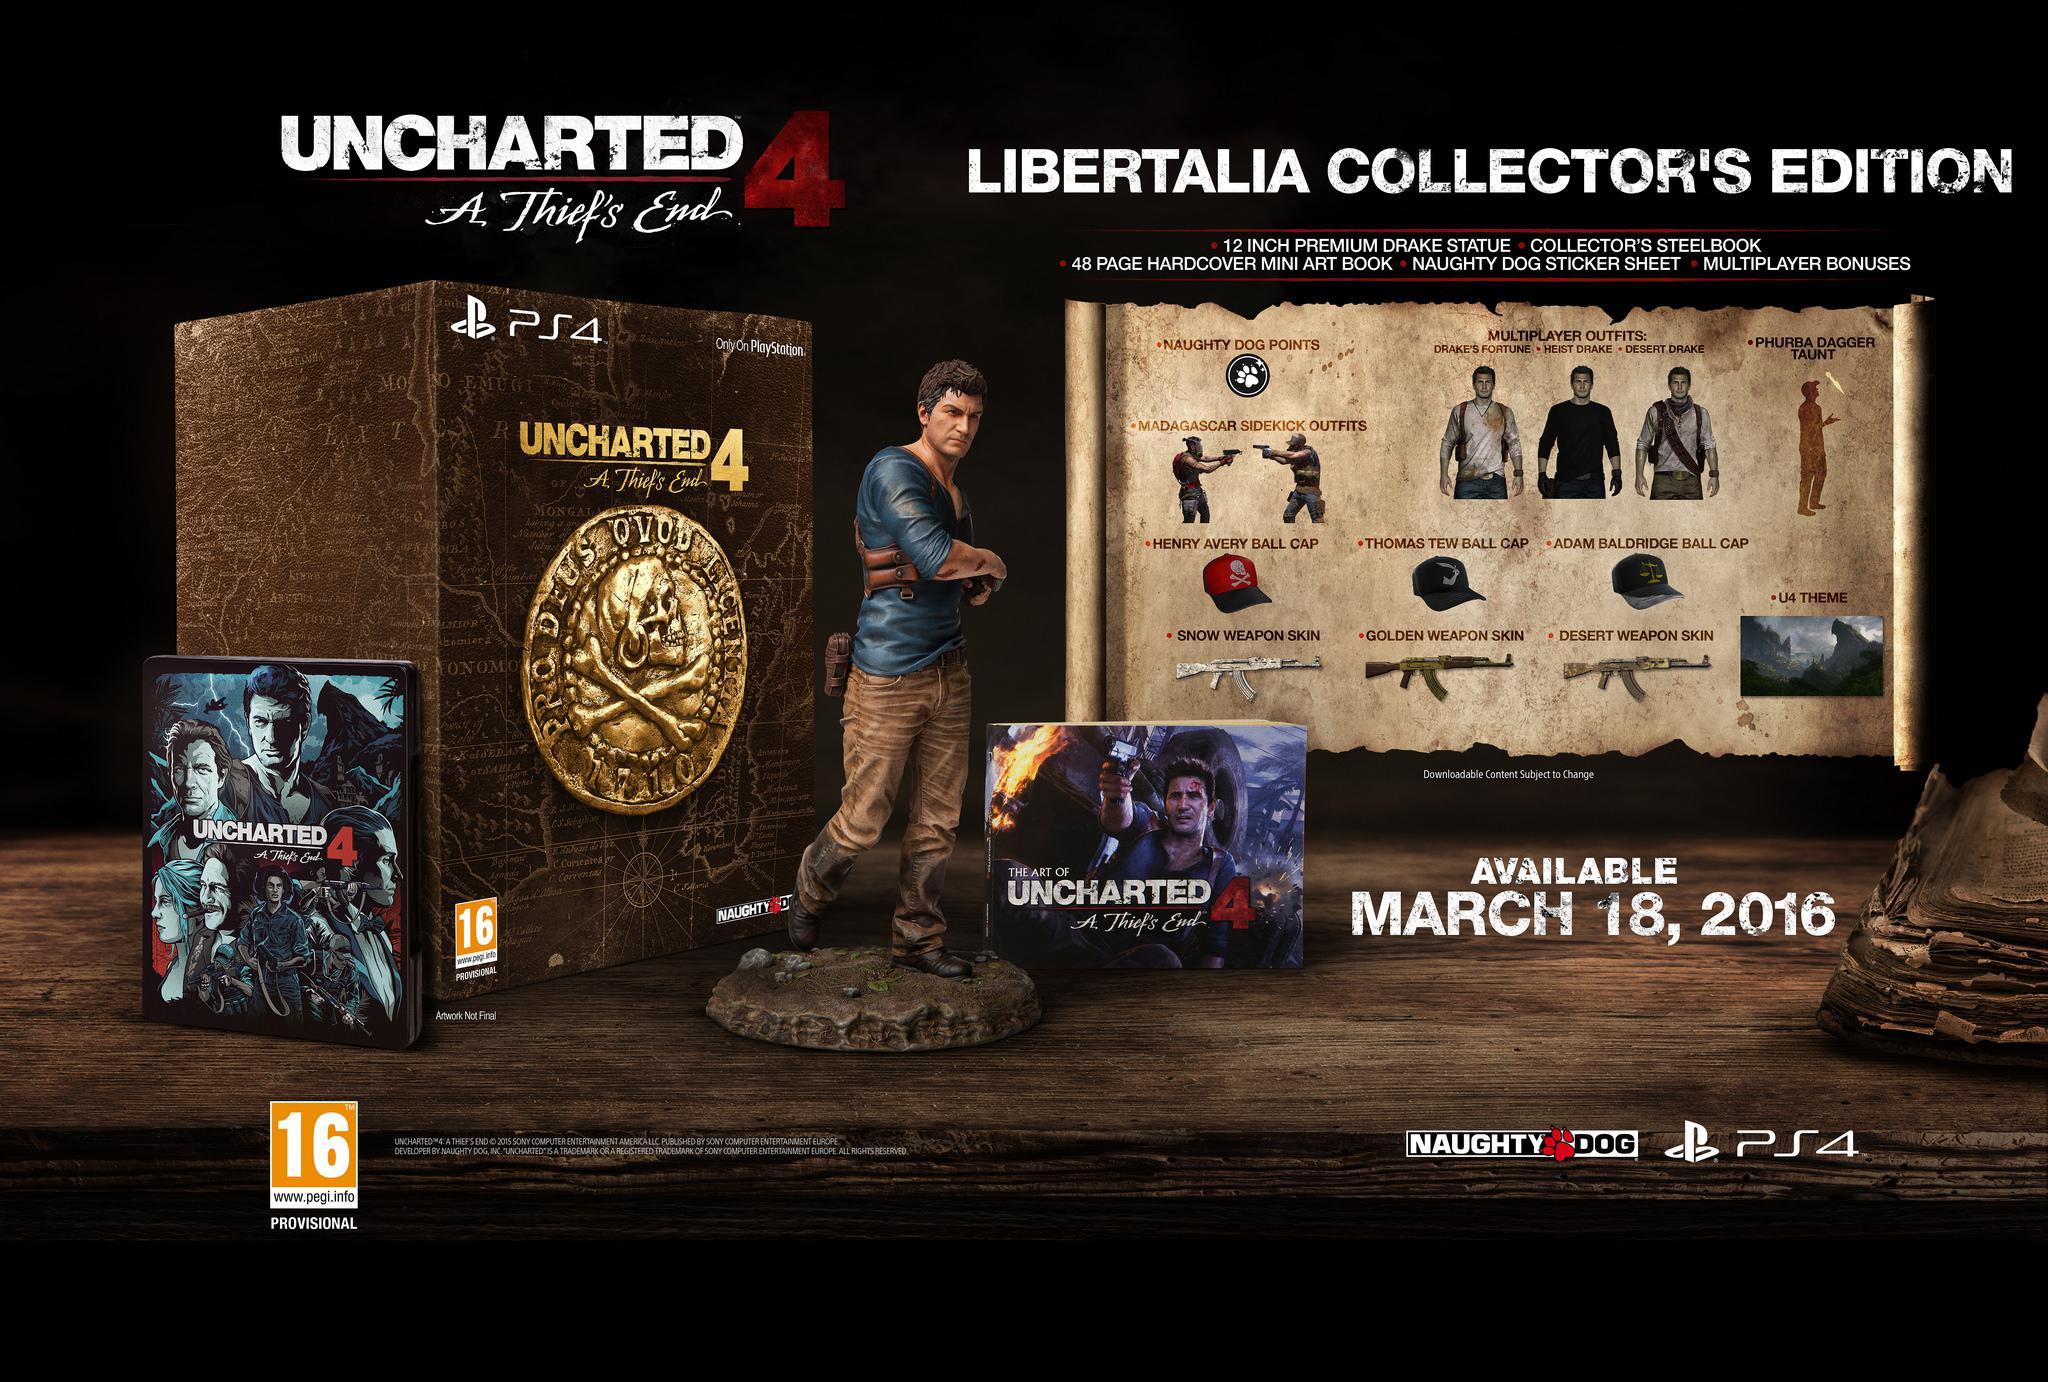 Unchrated 4 - Libertalia